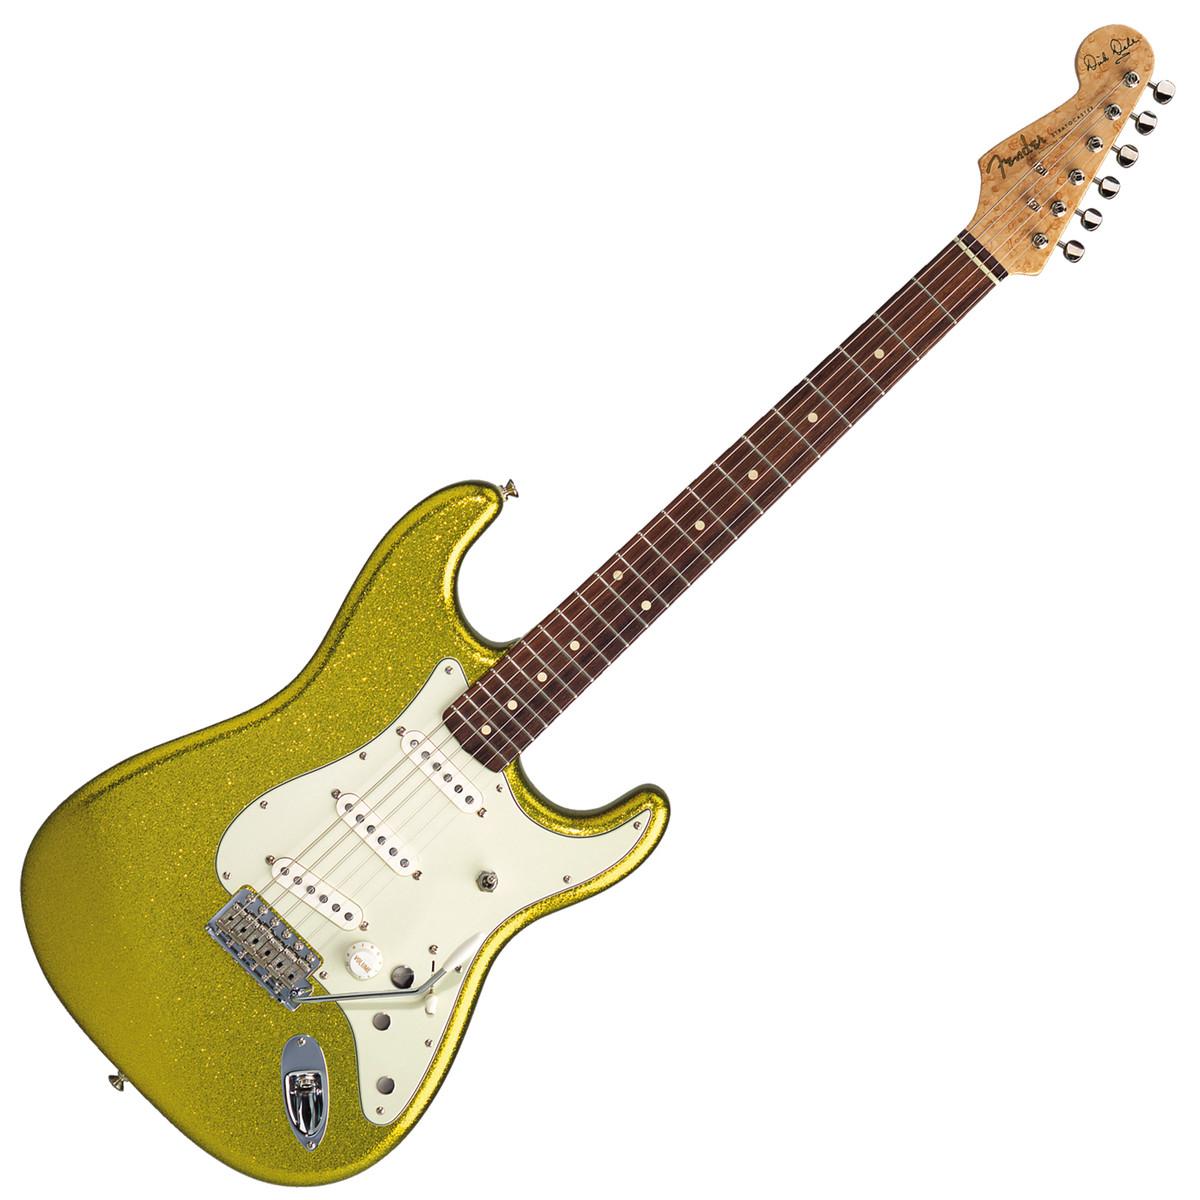 Dick Dale Stratocaster 65